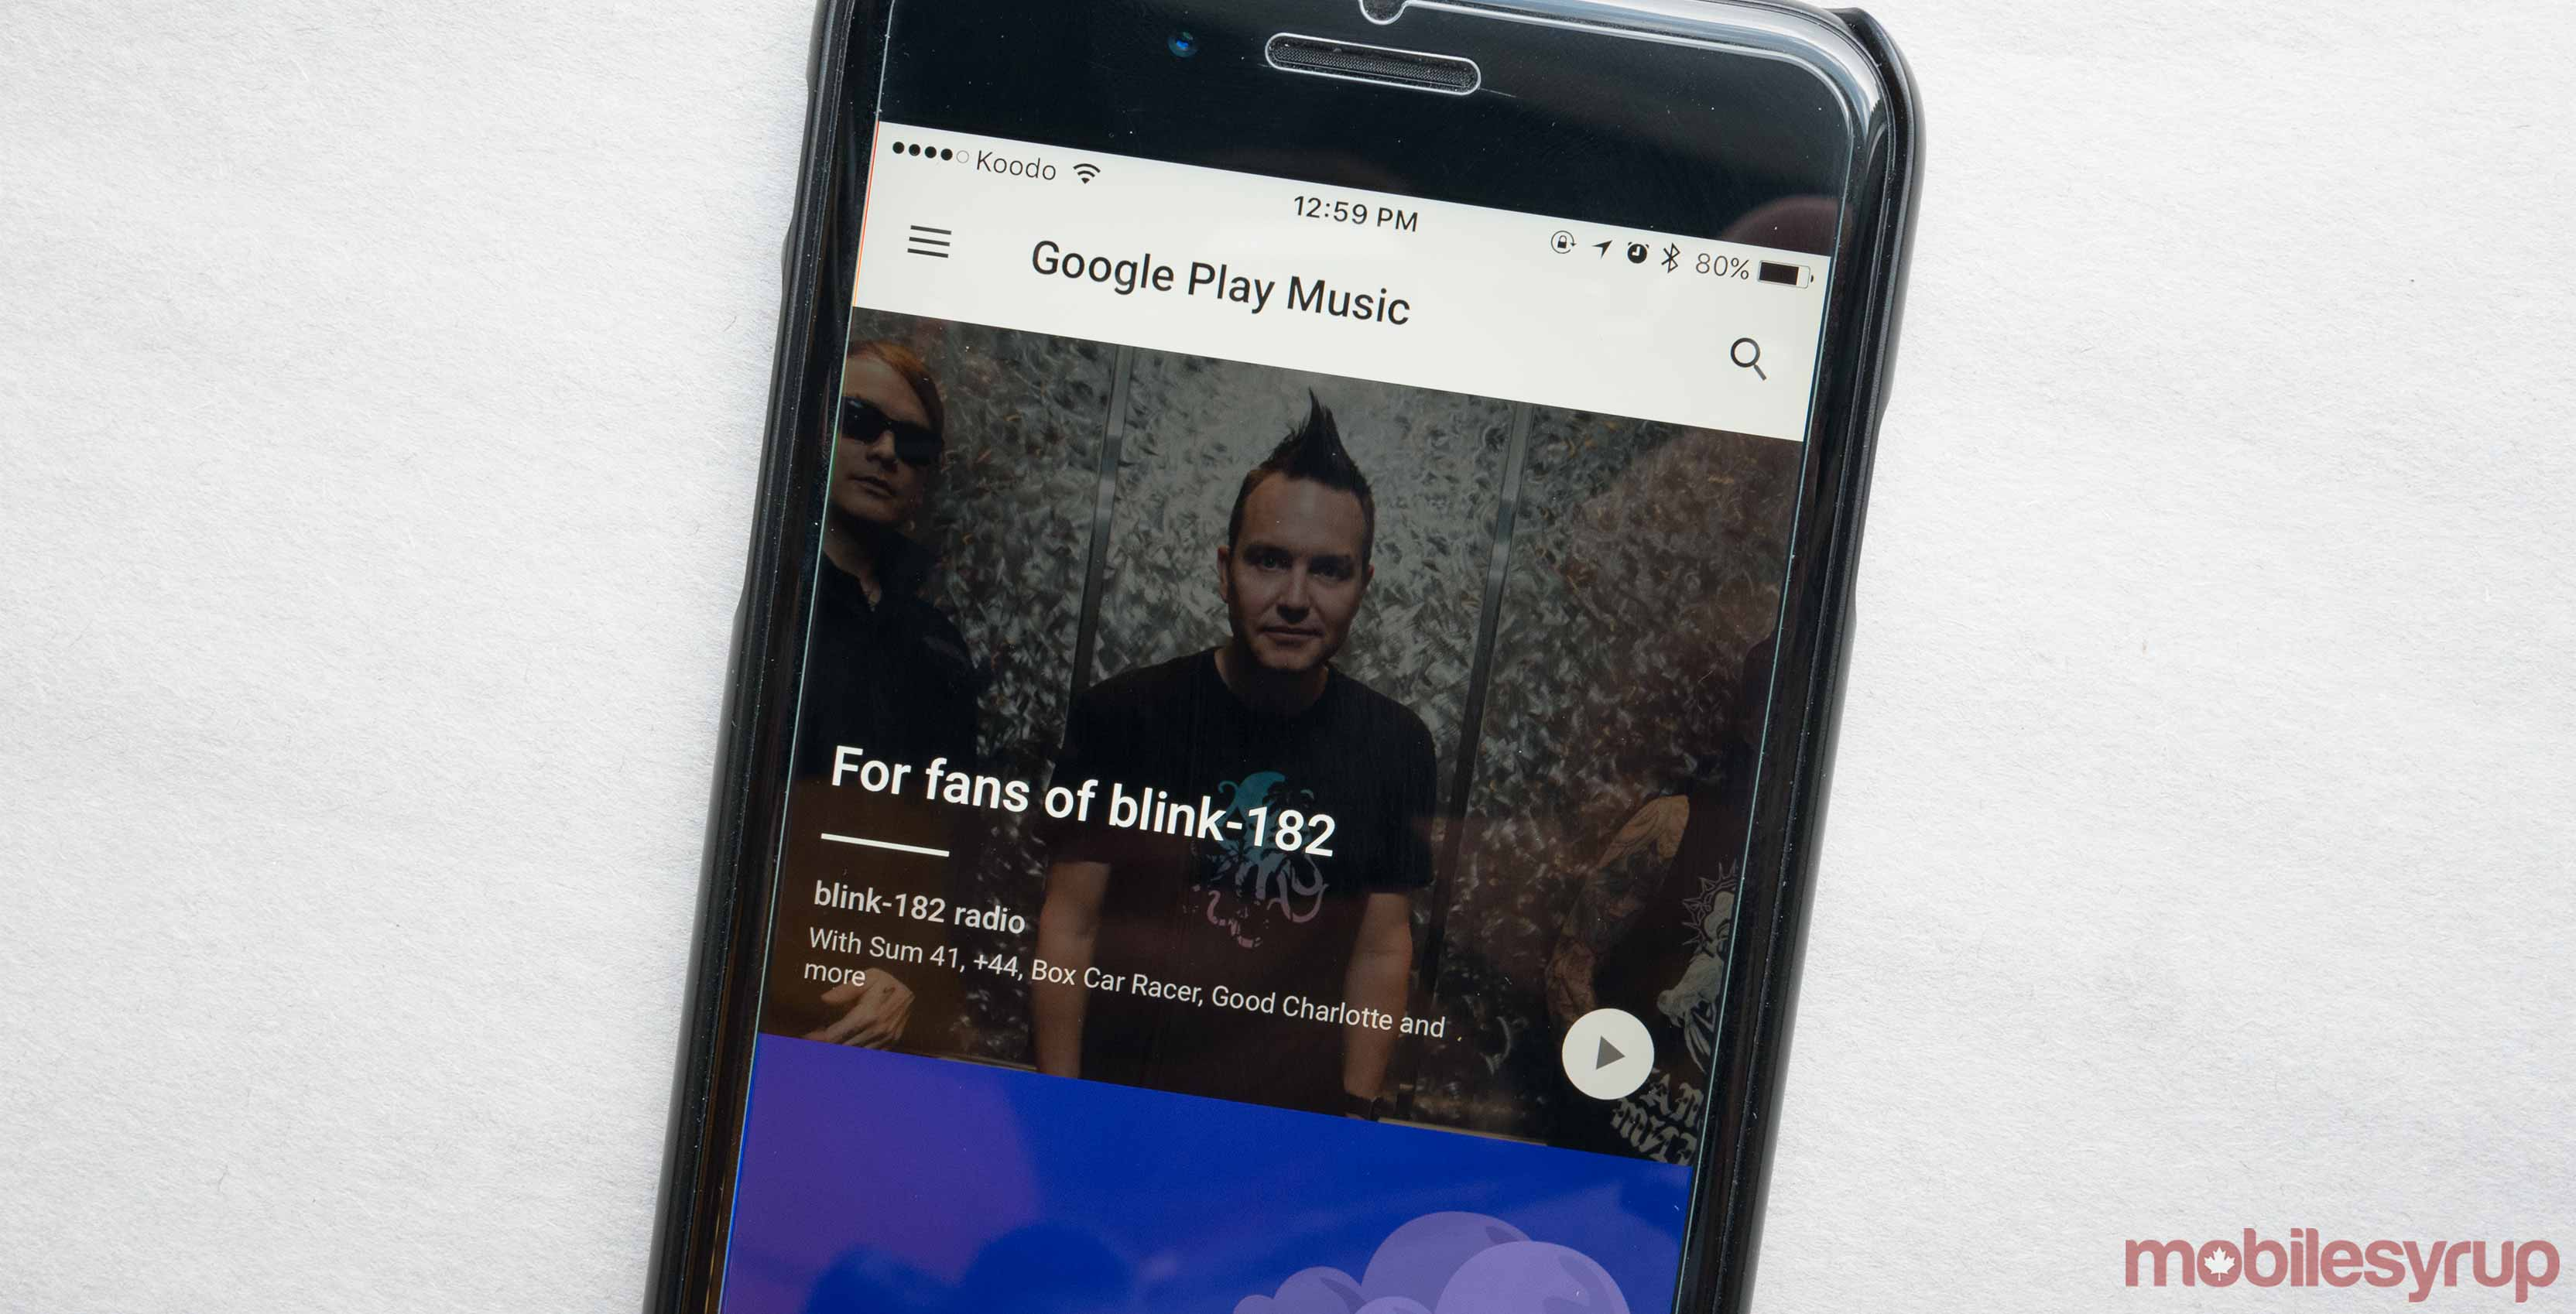 Google Play Music on phone